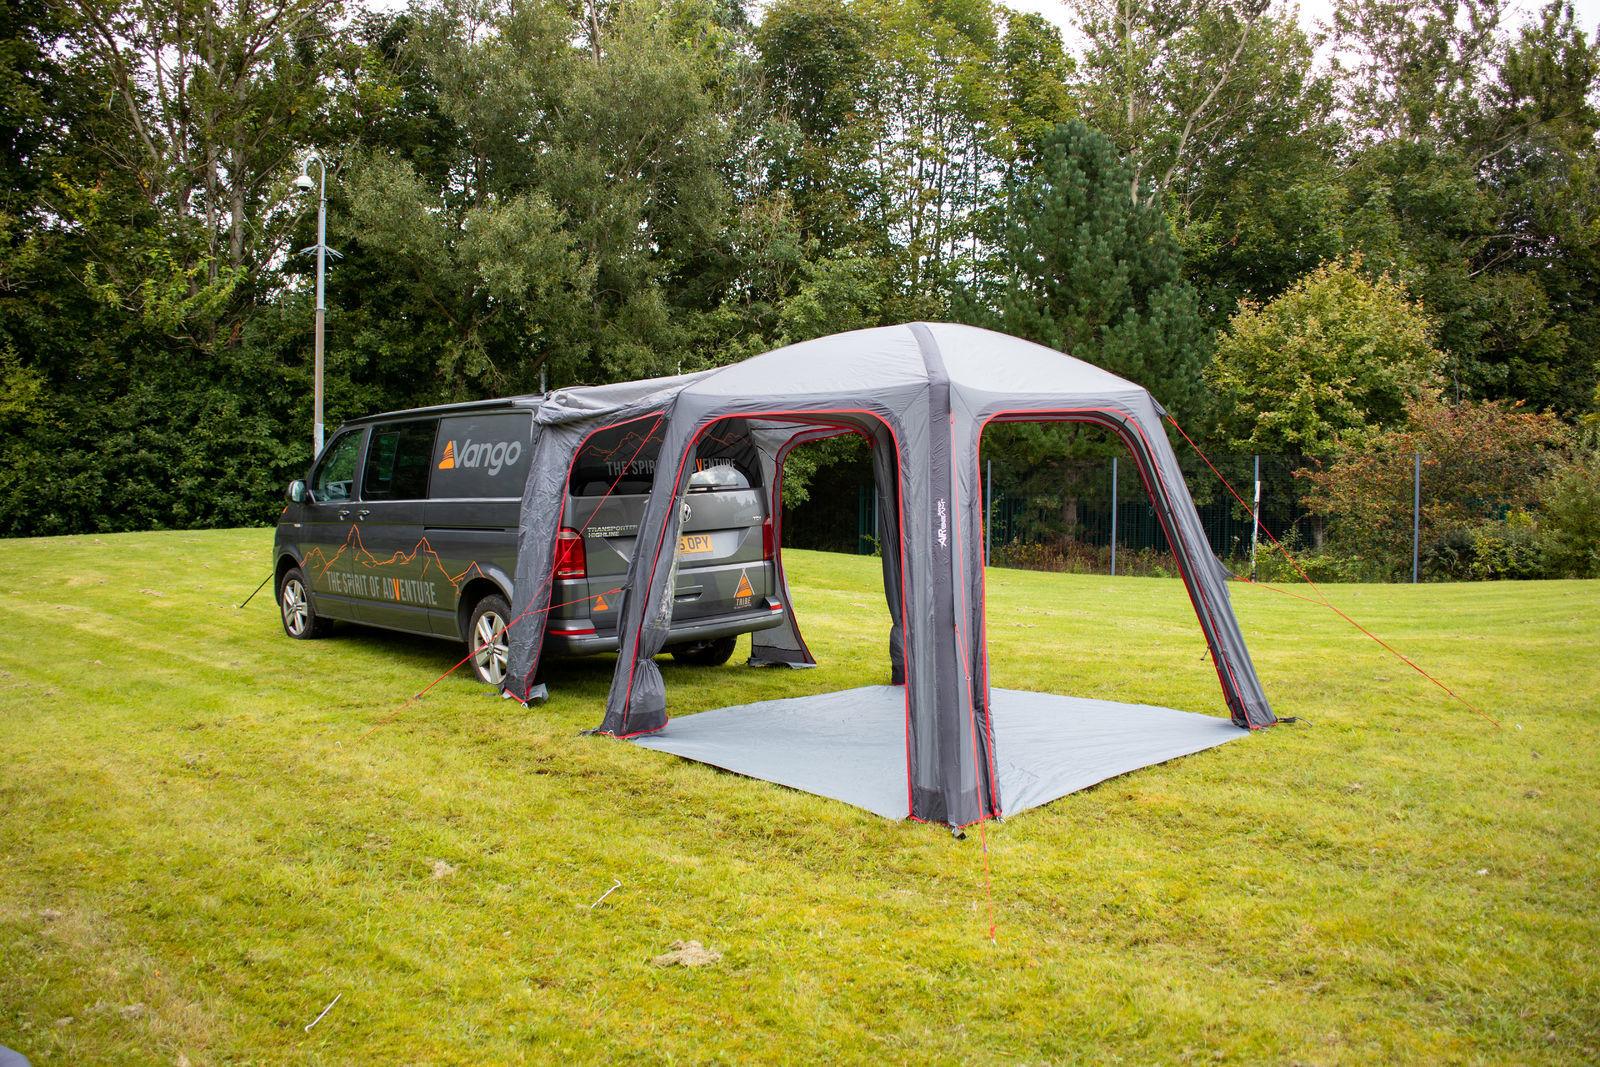 Vango Tailgate Airhub Low 2021 Norwich Camping 3